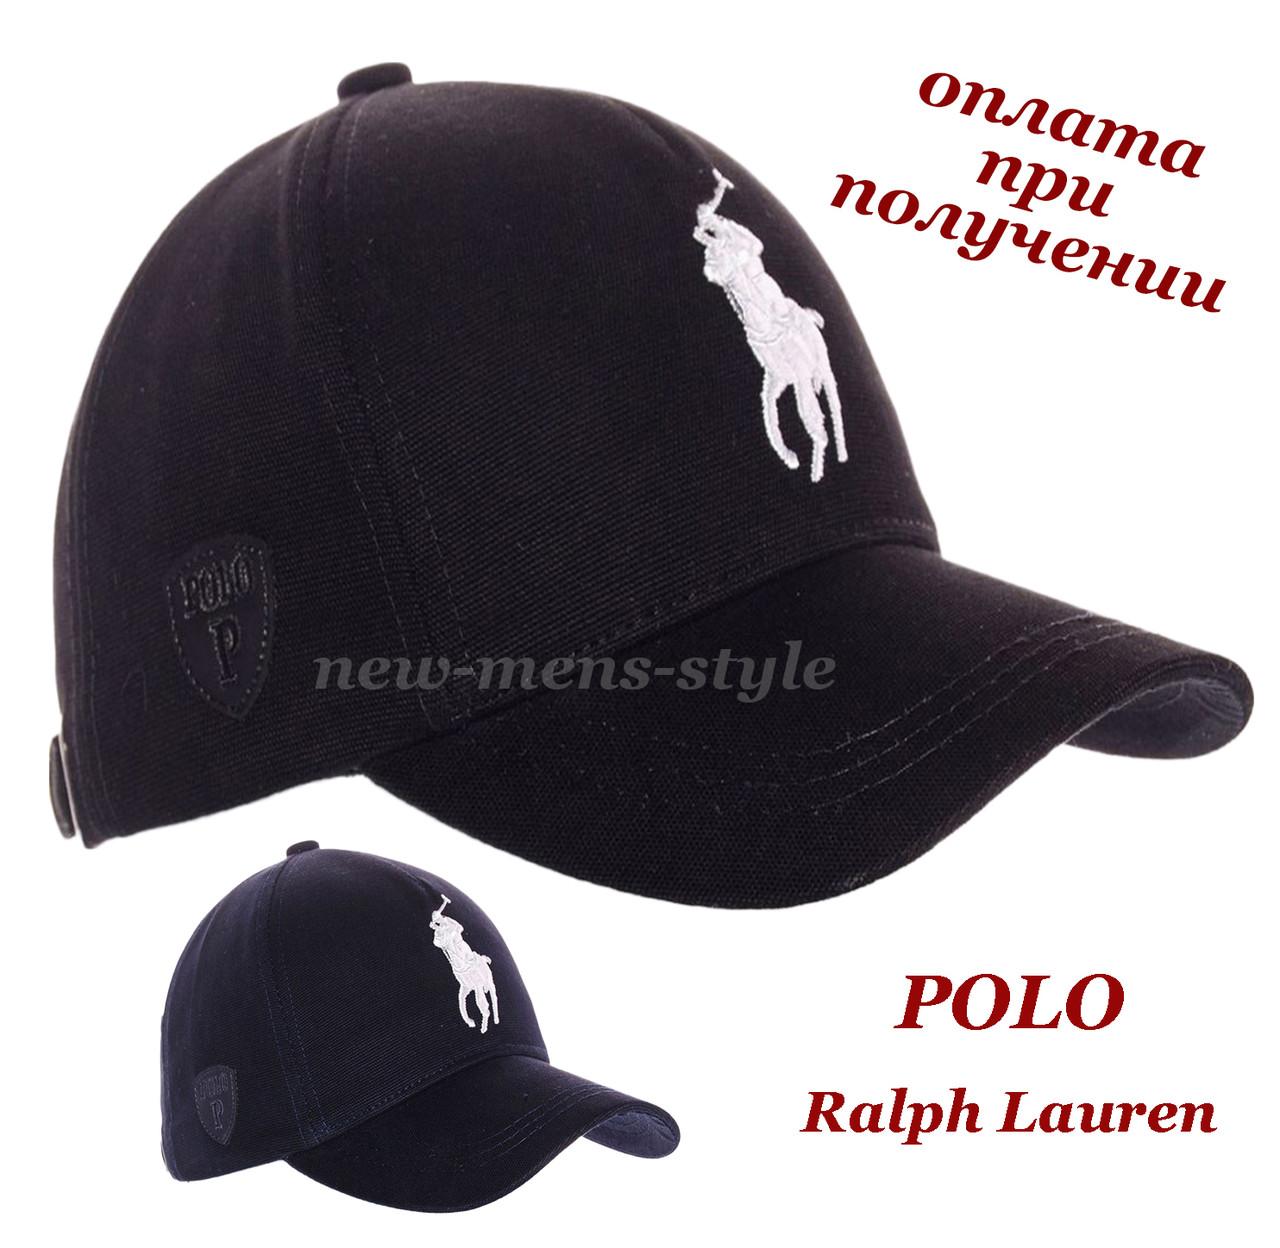 Чоловіча молодіжна модна стильна спортивна кепка бейсболка блайзер POLO Ralph Lauren Sport (4)